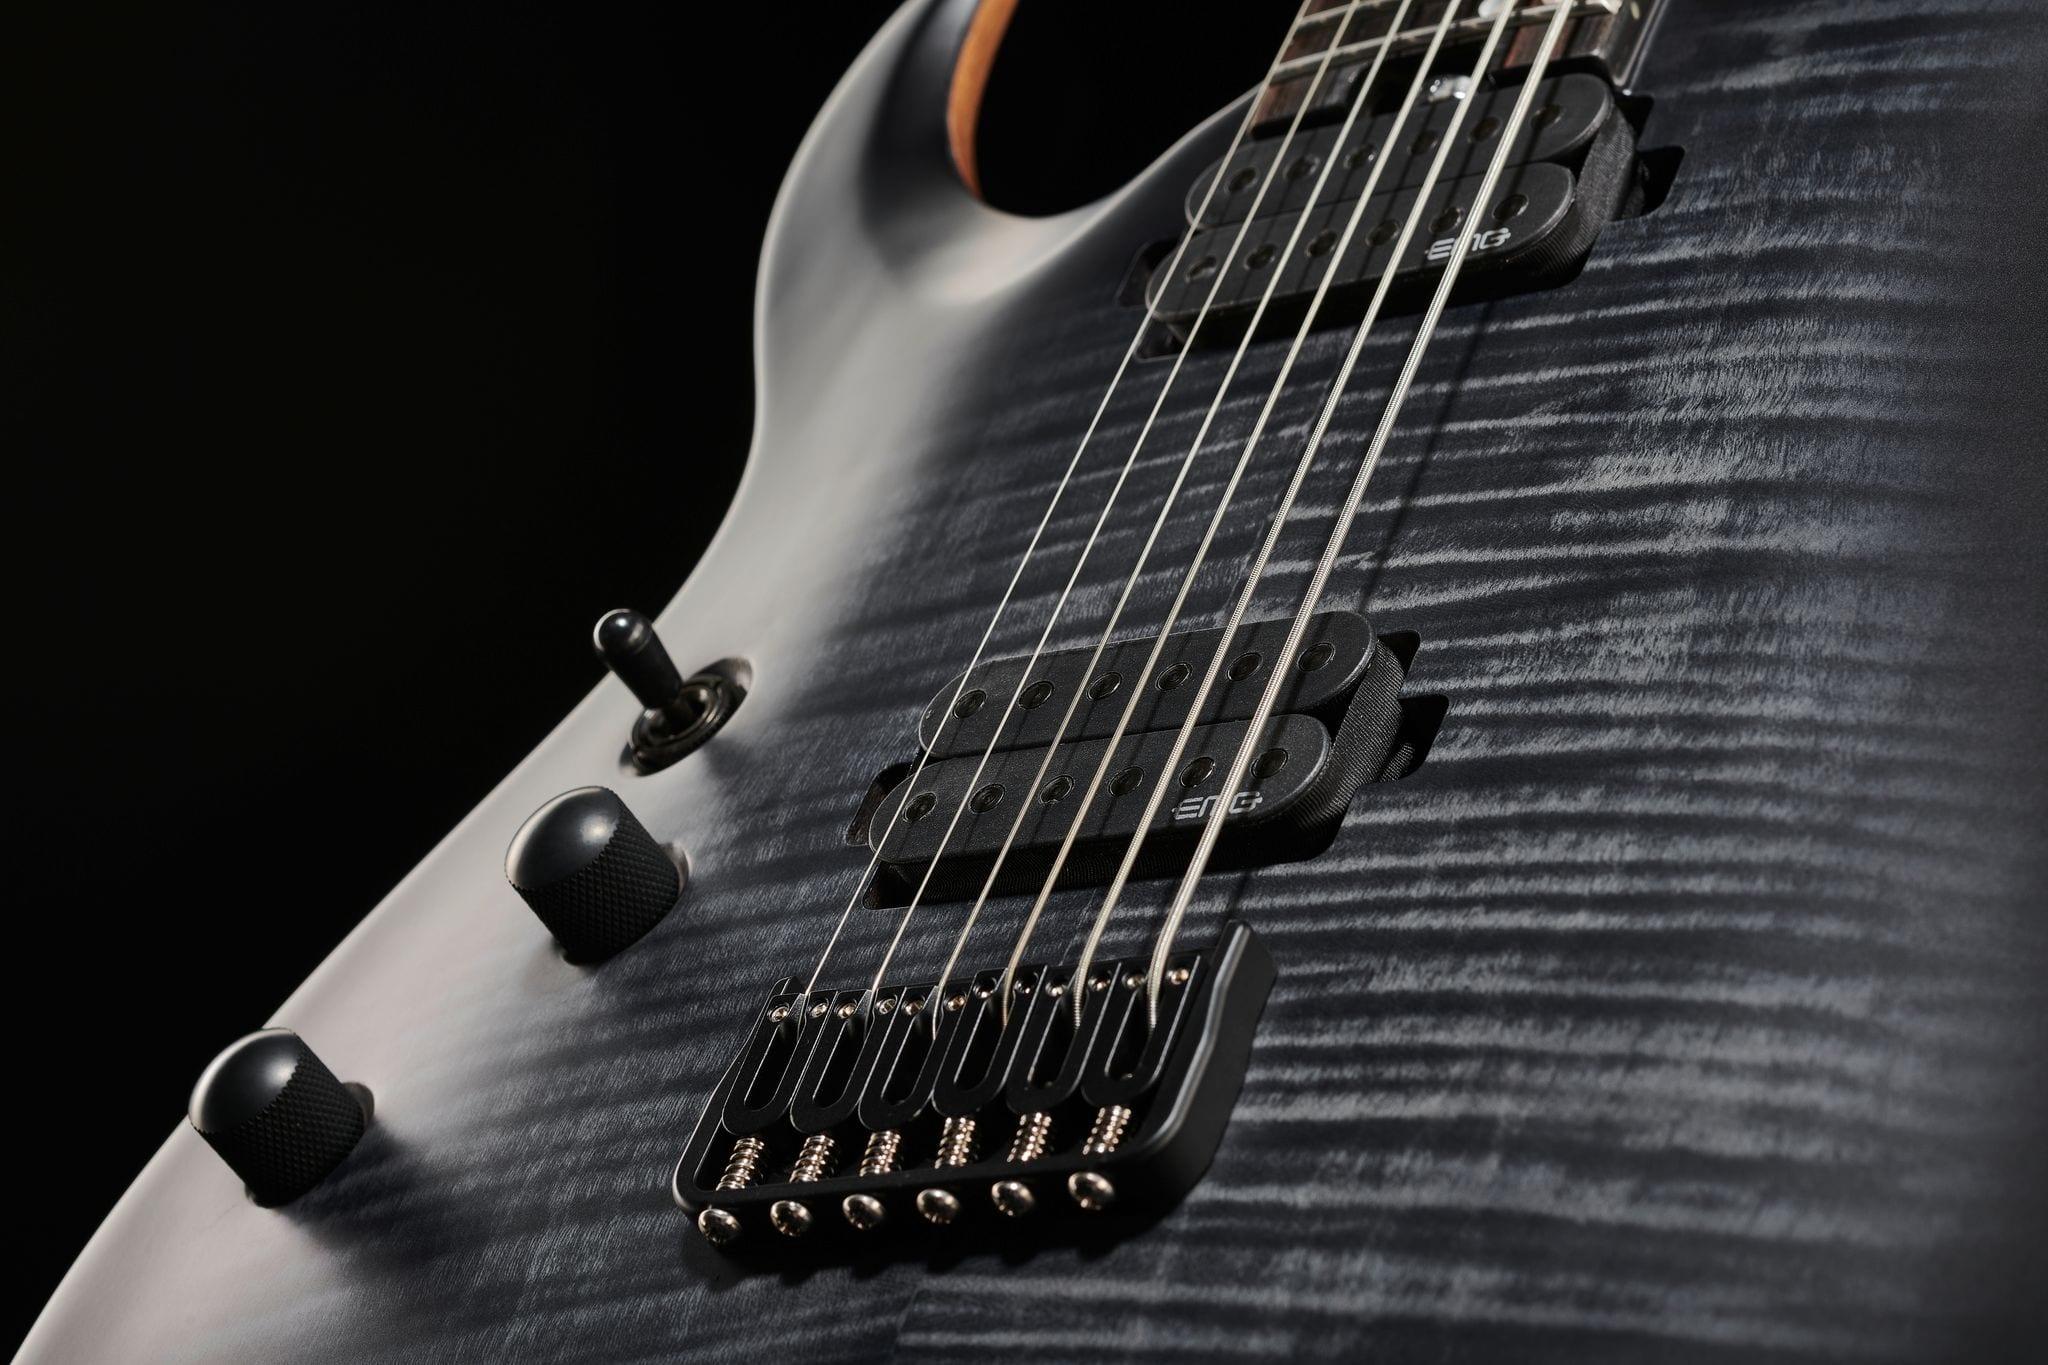 Amarok-BT LH is a baritone guitar with attitude and EMGs!